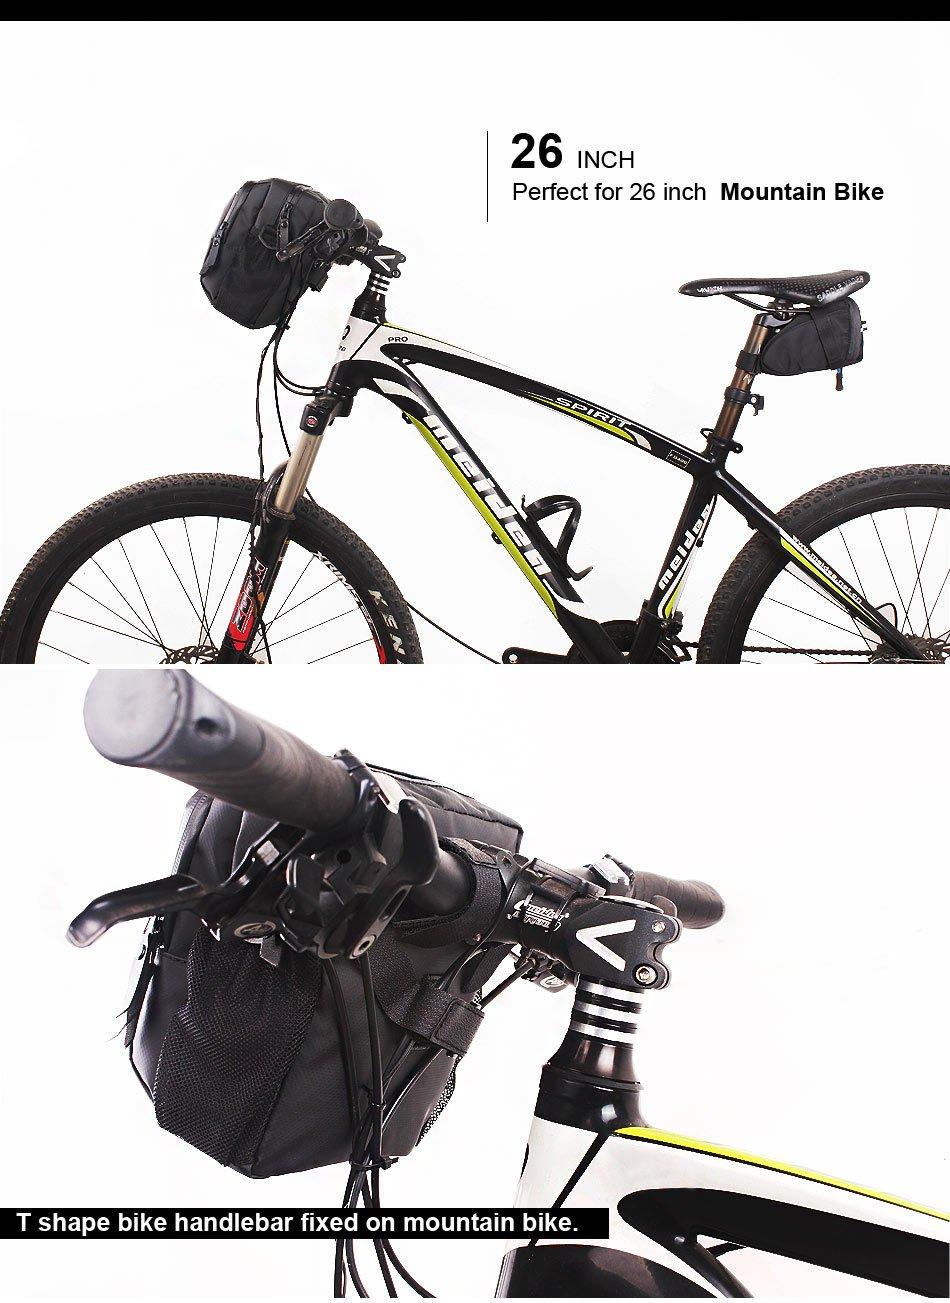 Rhinowalk Bike Bag Bike Handlebar Bag Waterproof Road Bike Saddle Bag Bike Frame Bag Bike Basket Bag Bicycle Bag Professional Cycling Accessories